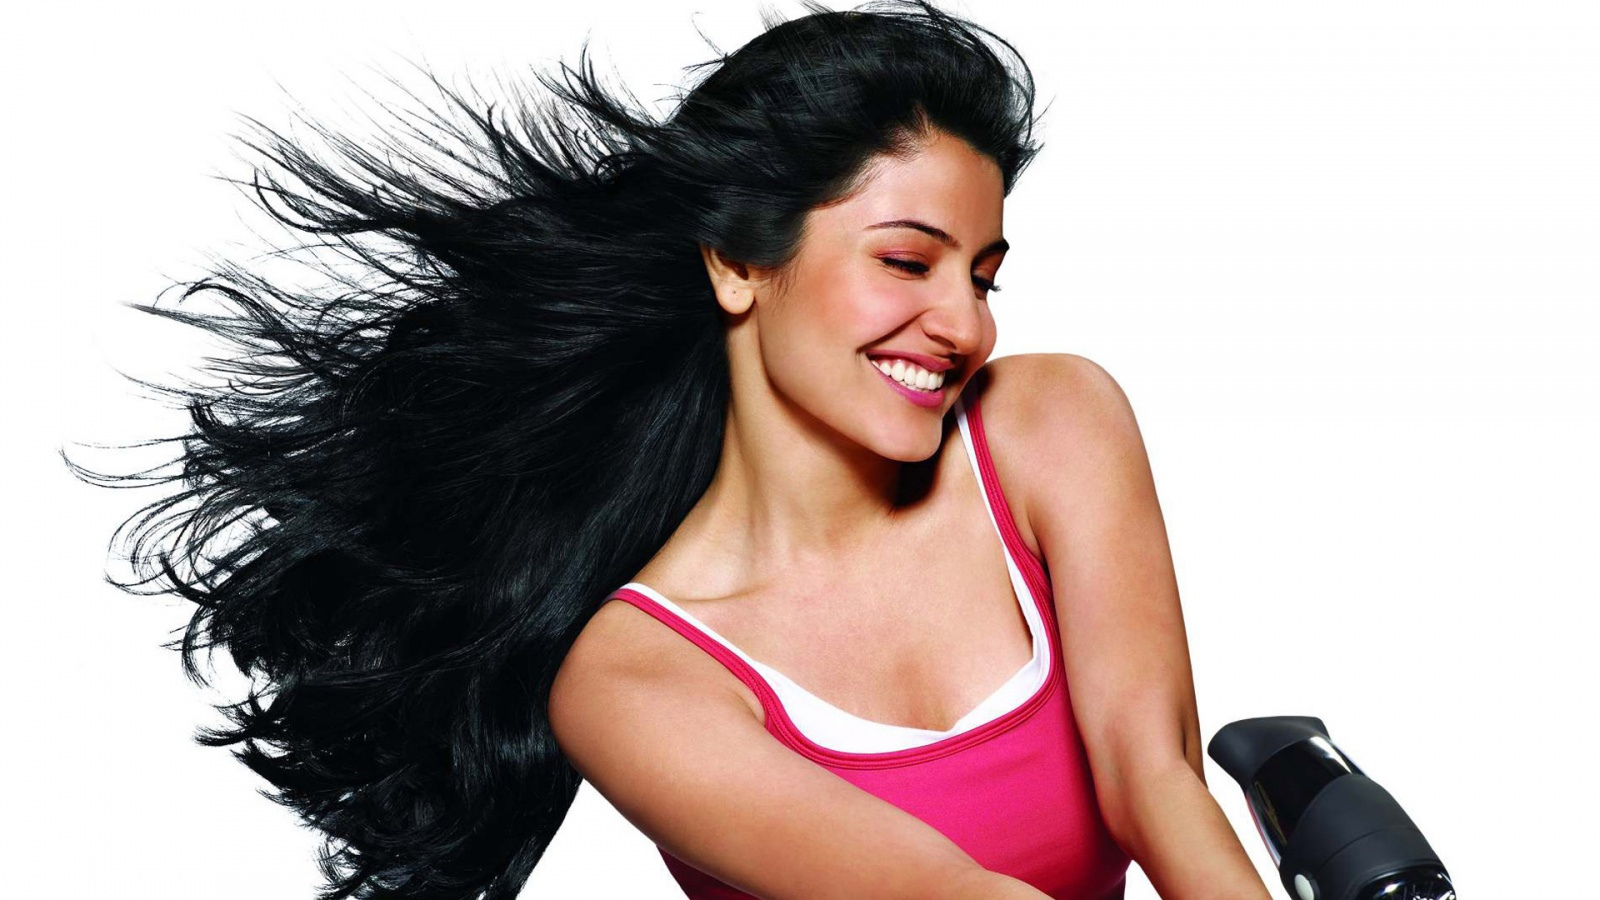 Beautiful Anushka Sharma Smile Face Desktop Mobile Background Free